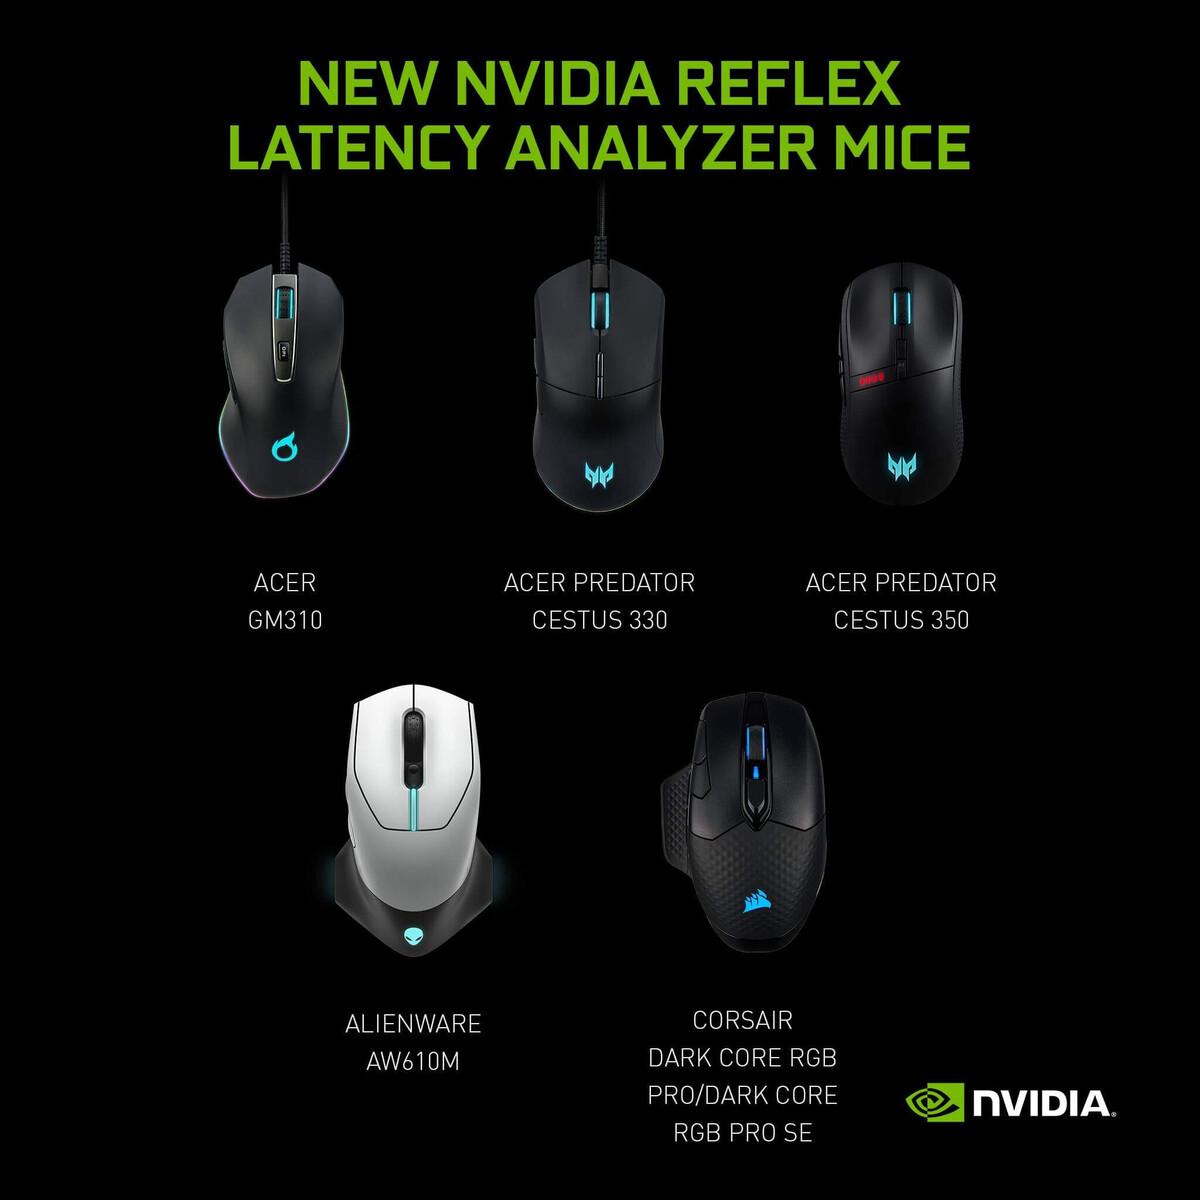 https://www.coolaler.com.tw/image/news/21/01/nvidia_reflex_4.jpg